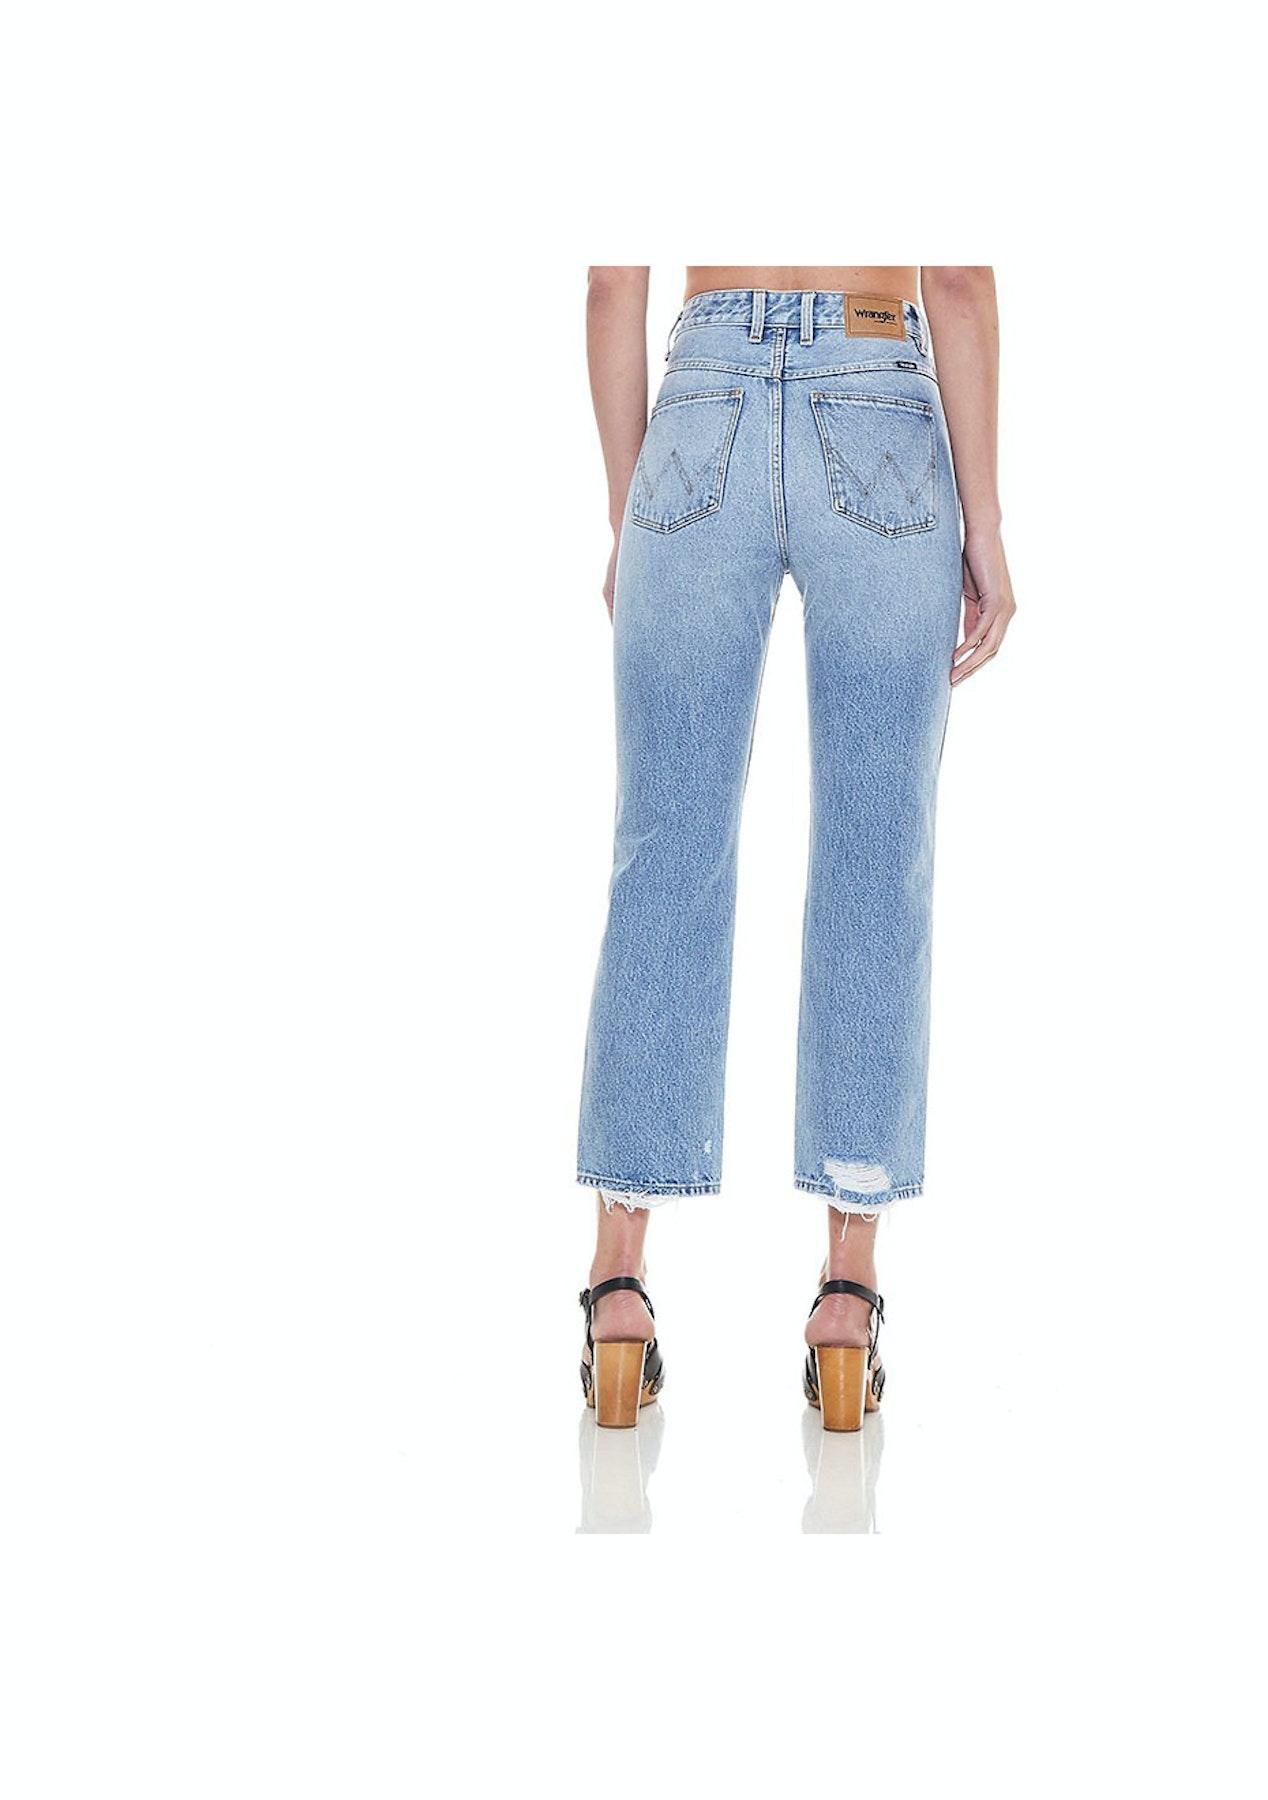 a2757c04aa Wrangler - Womens - Hi Birkin Jean - Strip Vintage - Wrangler   Lee ...